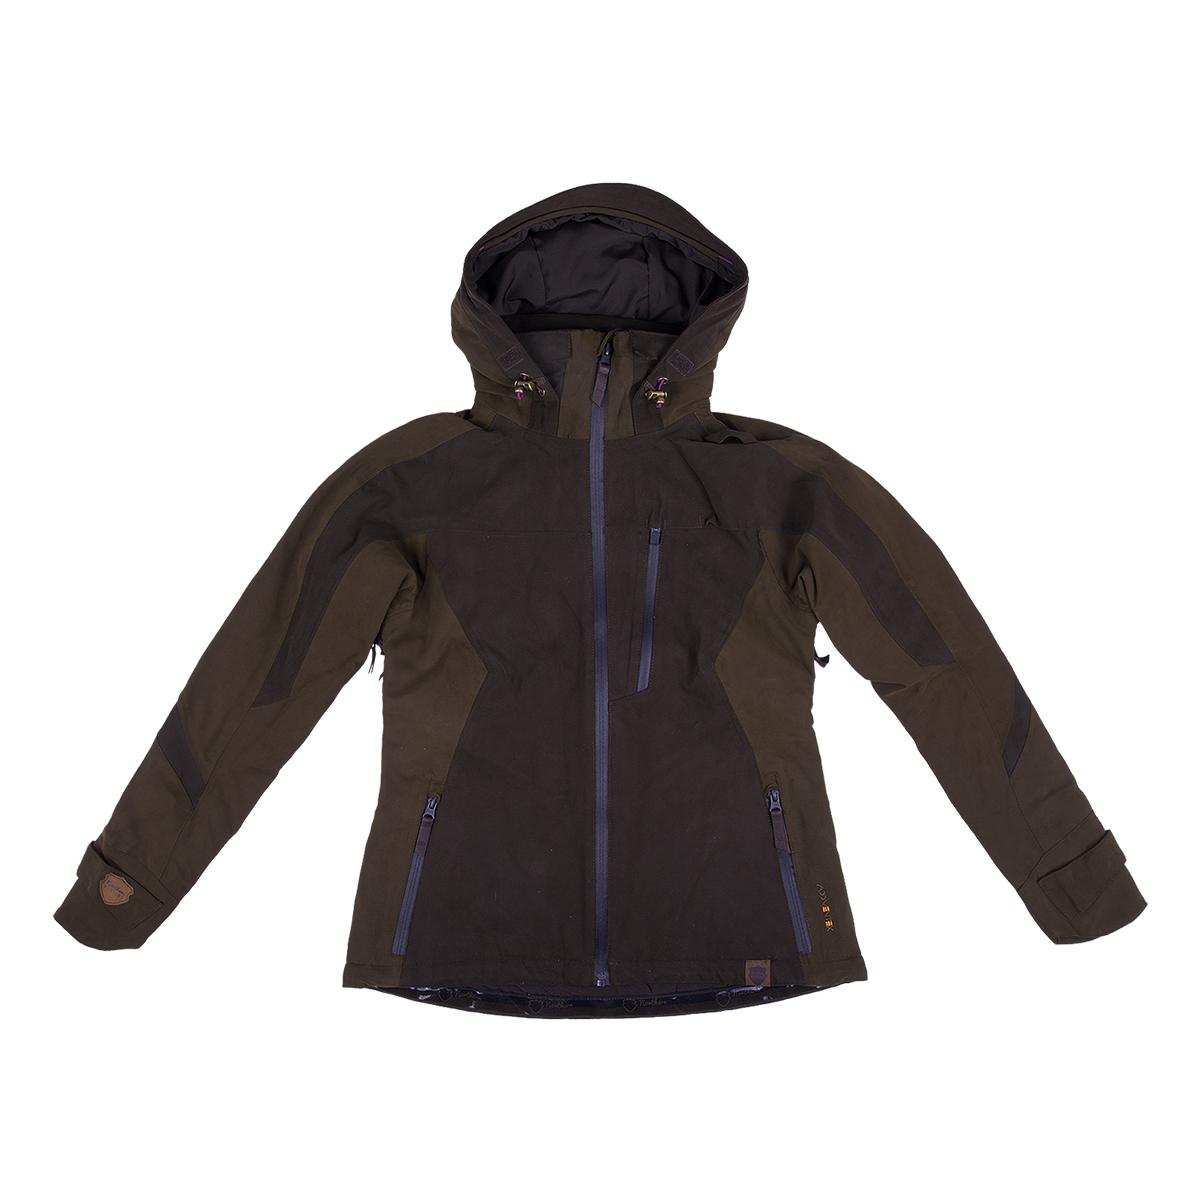 Northern Hunting Damenjacke Tora Sif - jetzt kaufen auf Pareyshop.de af919817ff